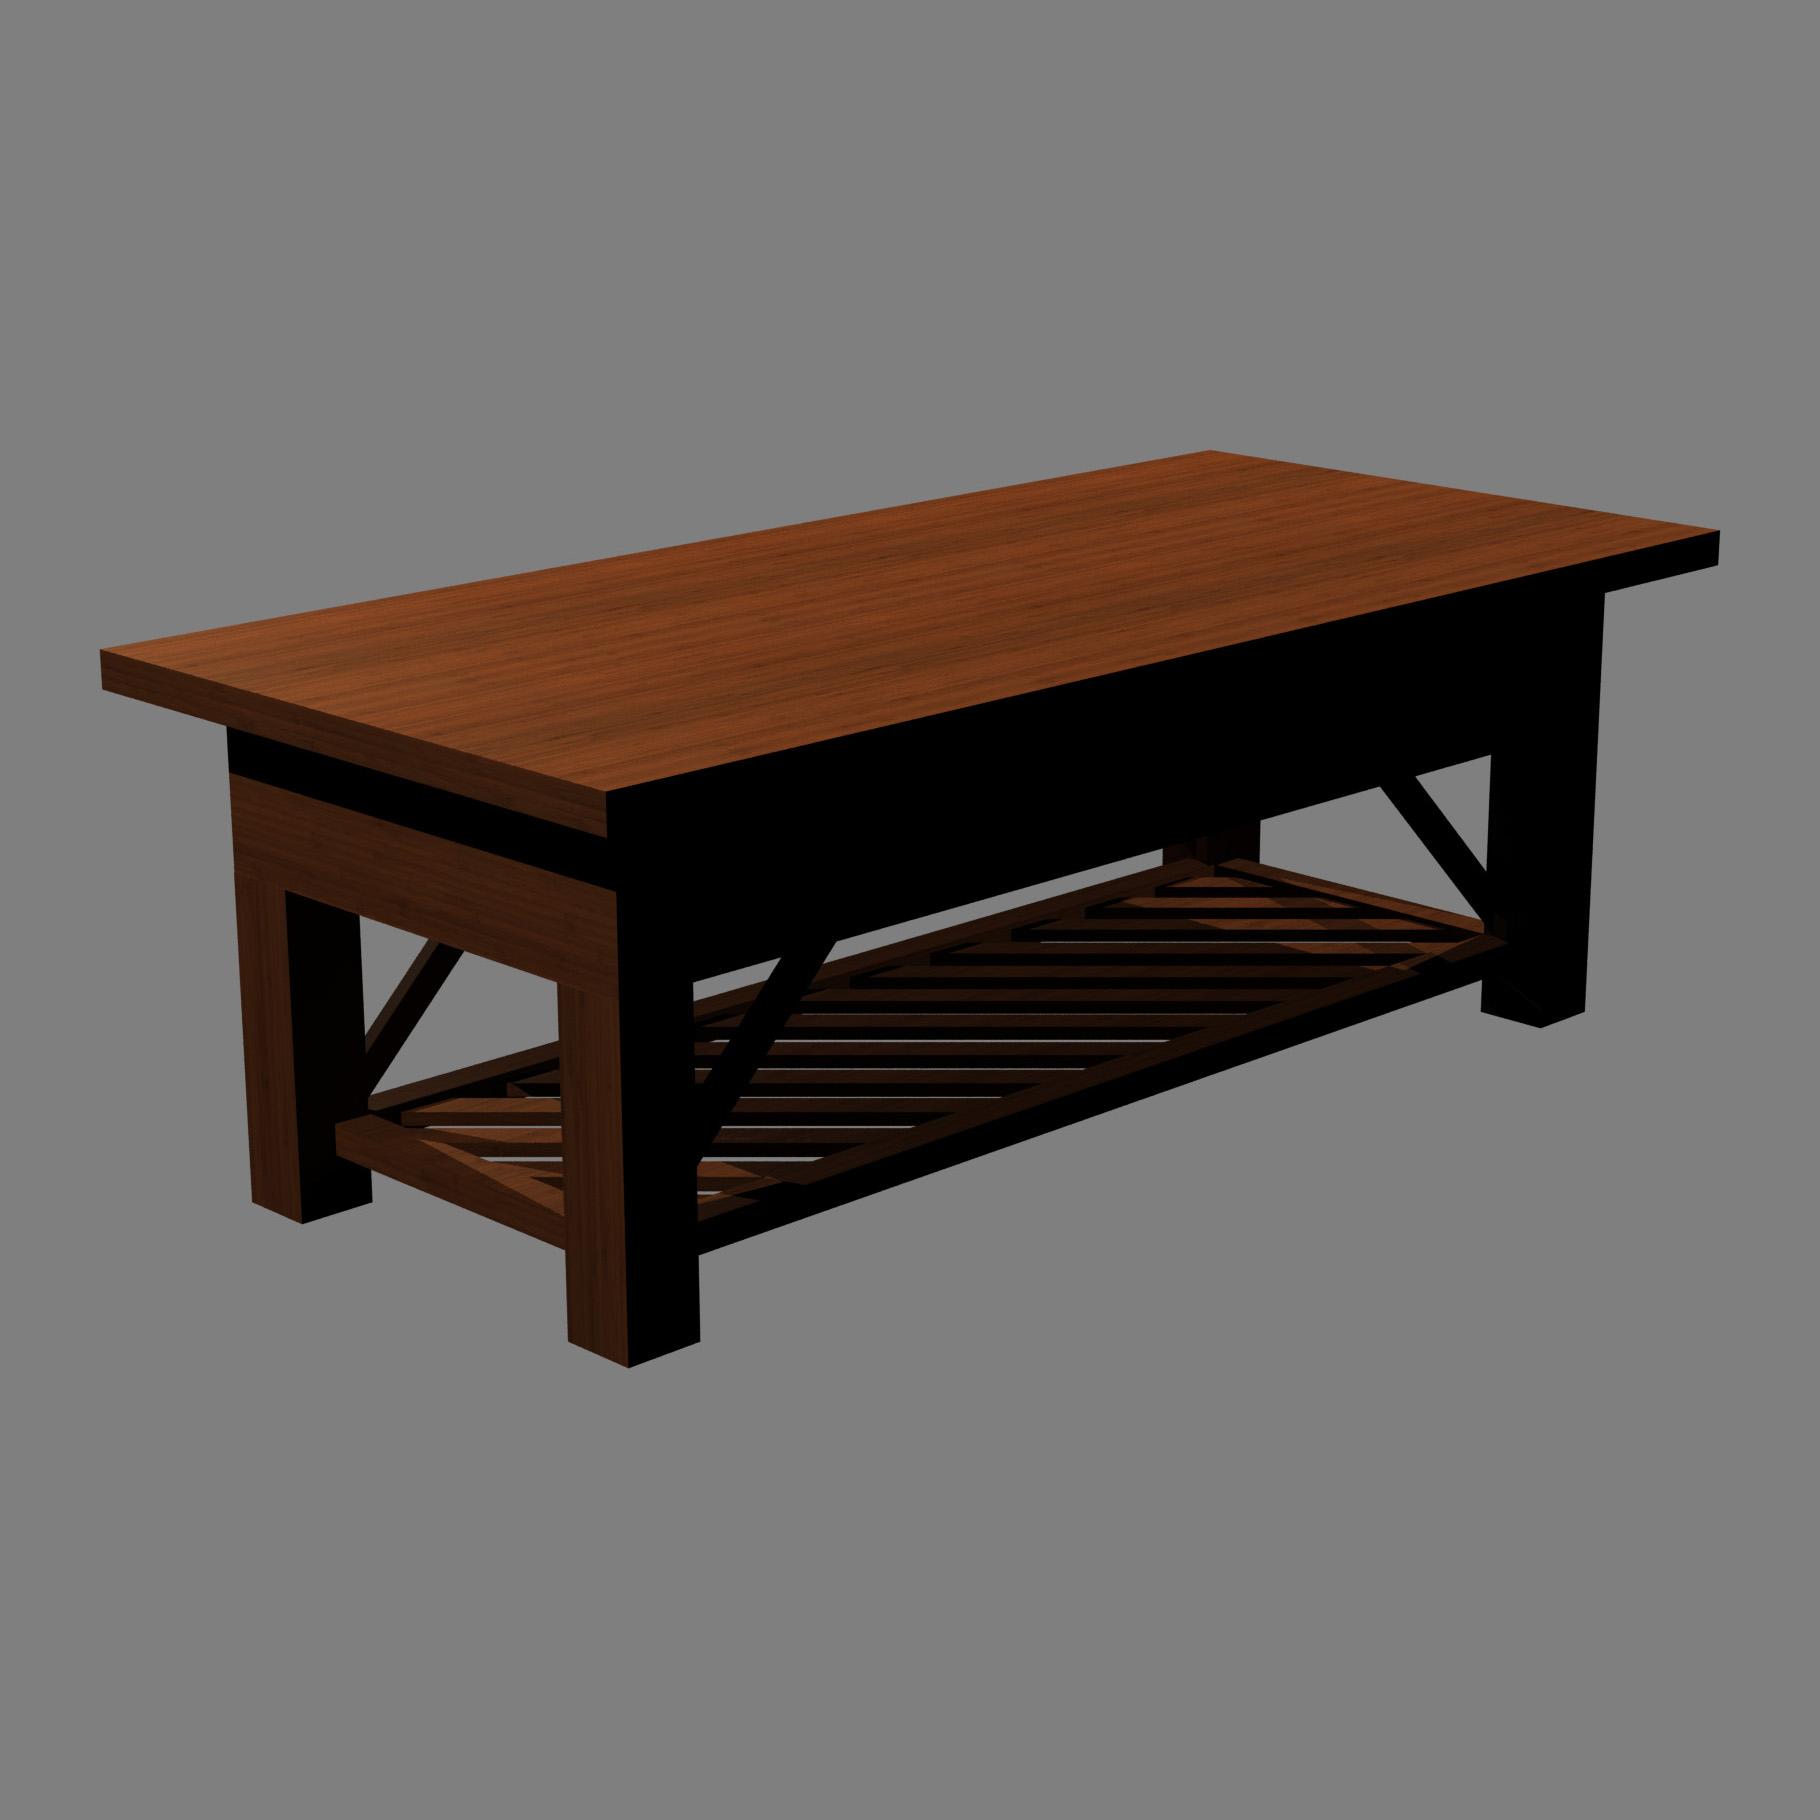 Coffee table 3d model buy coffee table 3d model for Model furniture